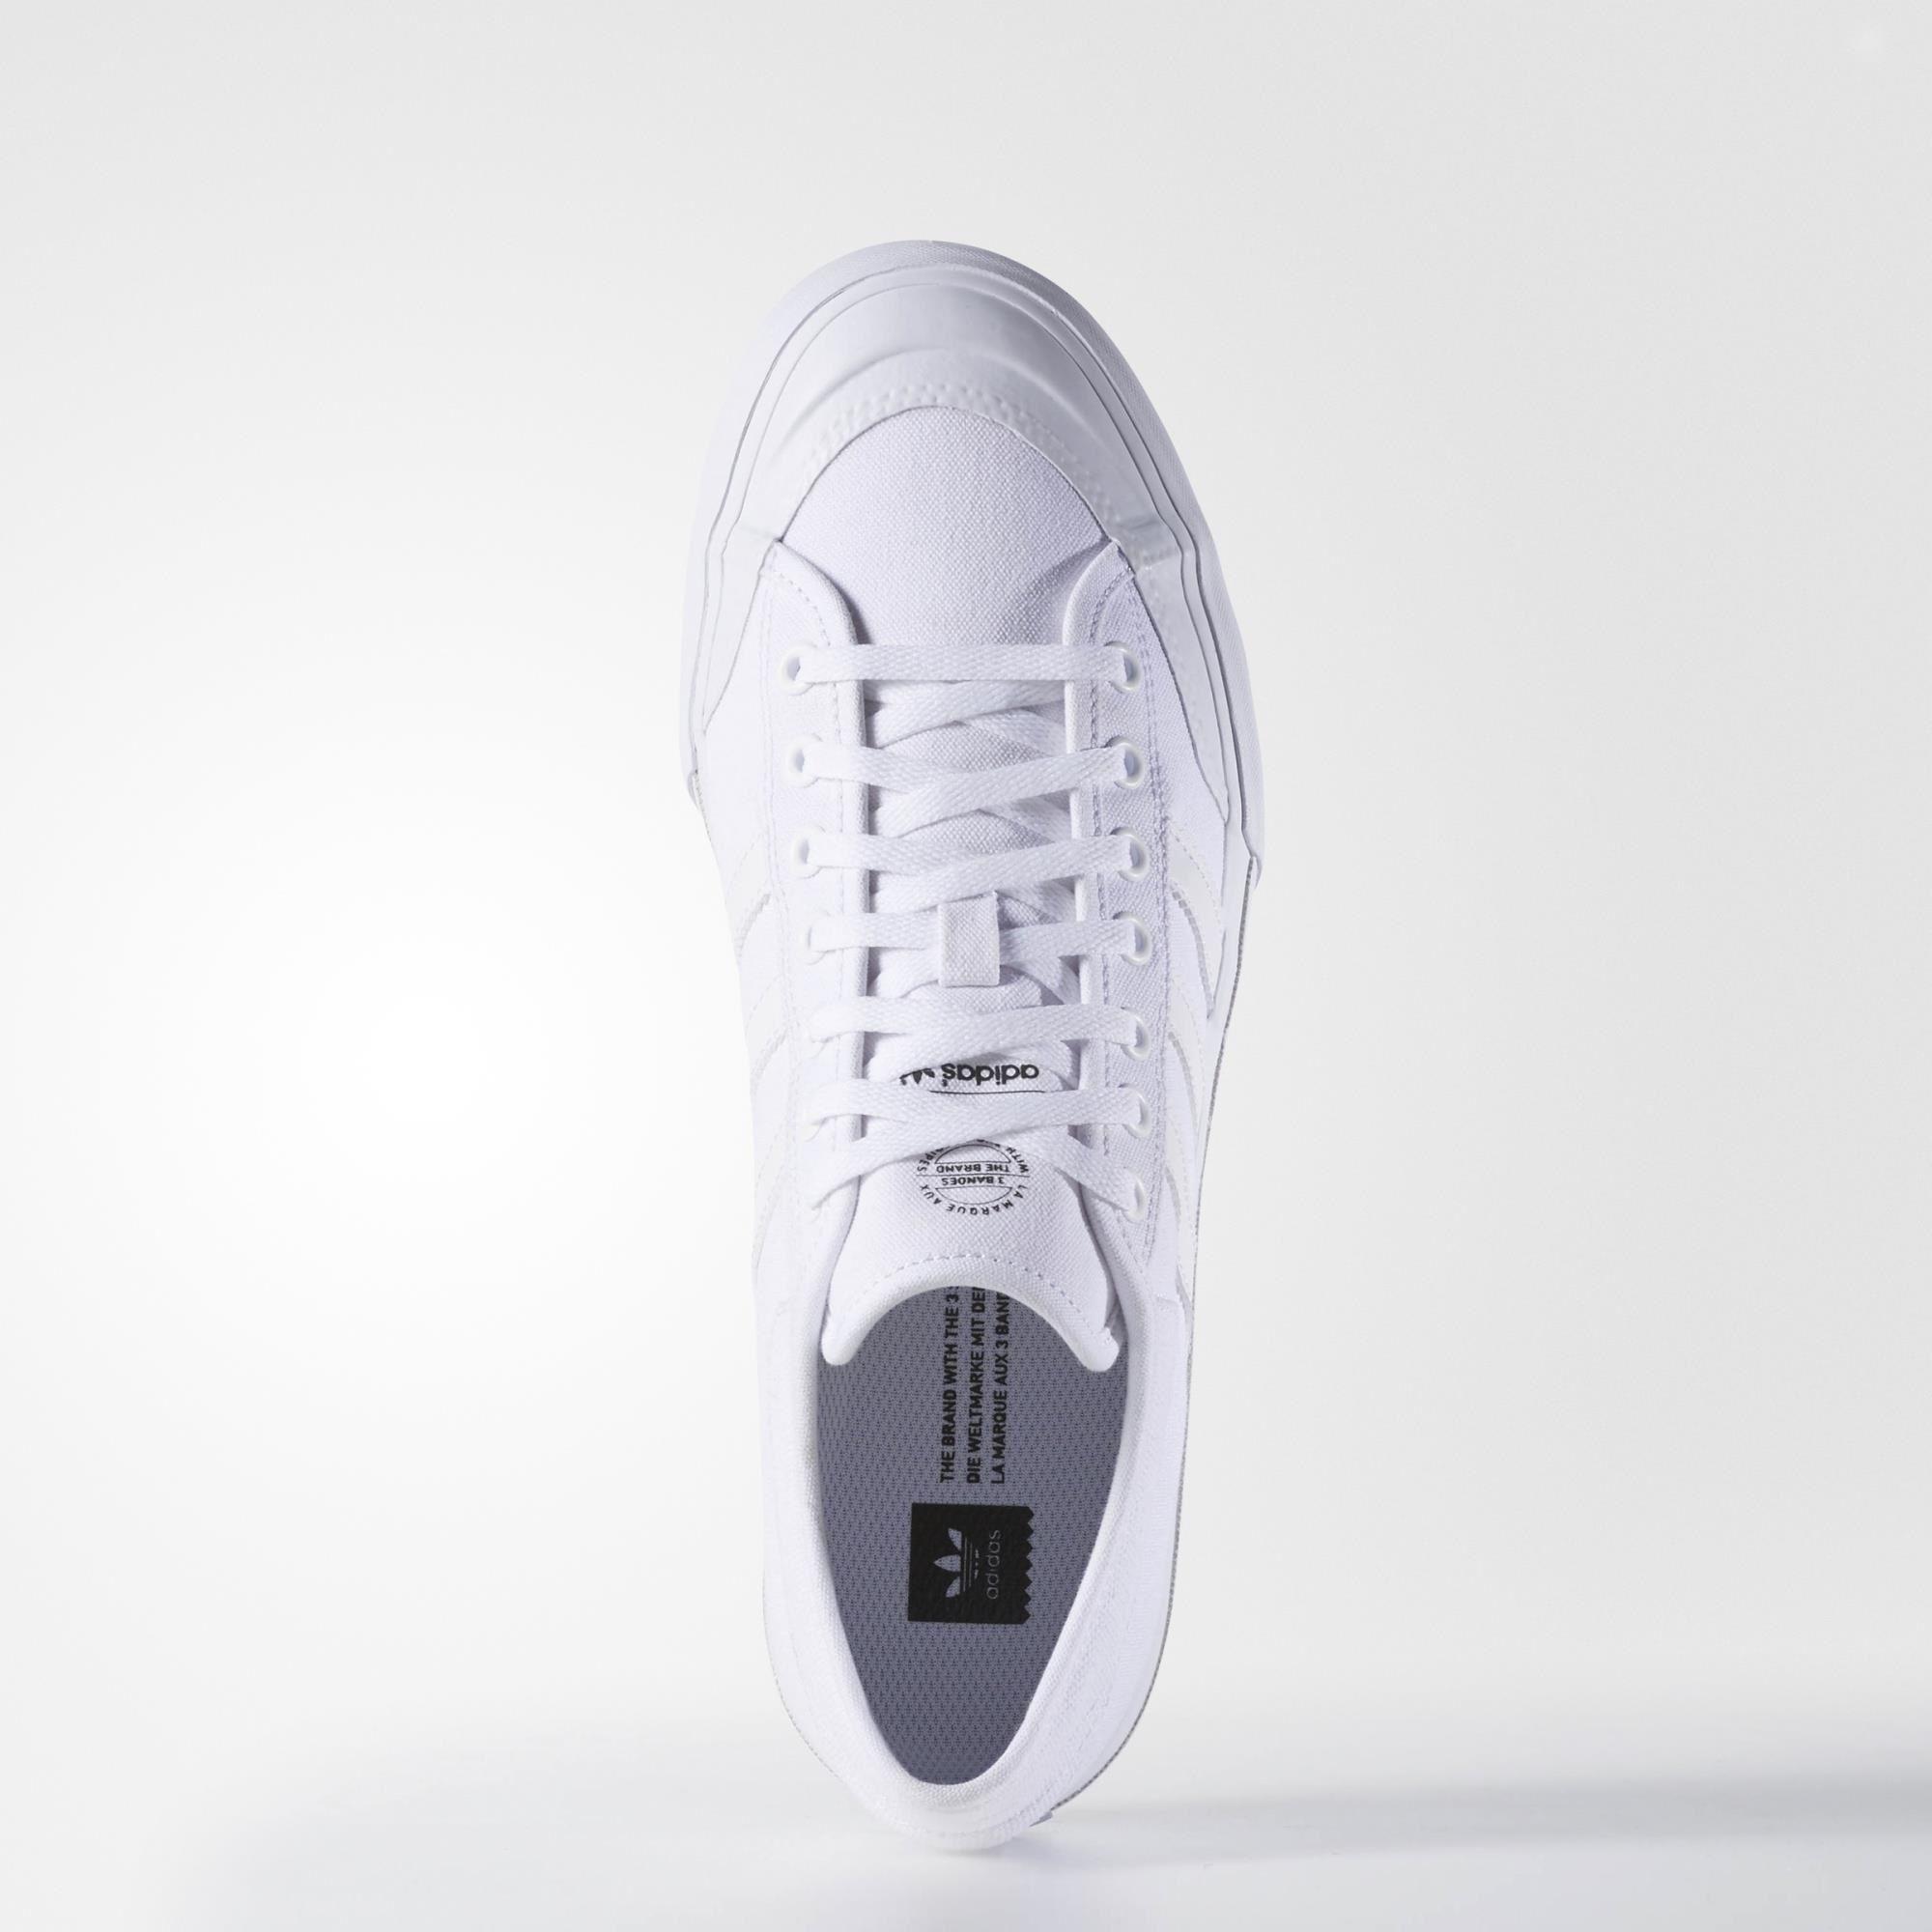 b47eb4d2c360 adidas - Matchcourt Shoes